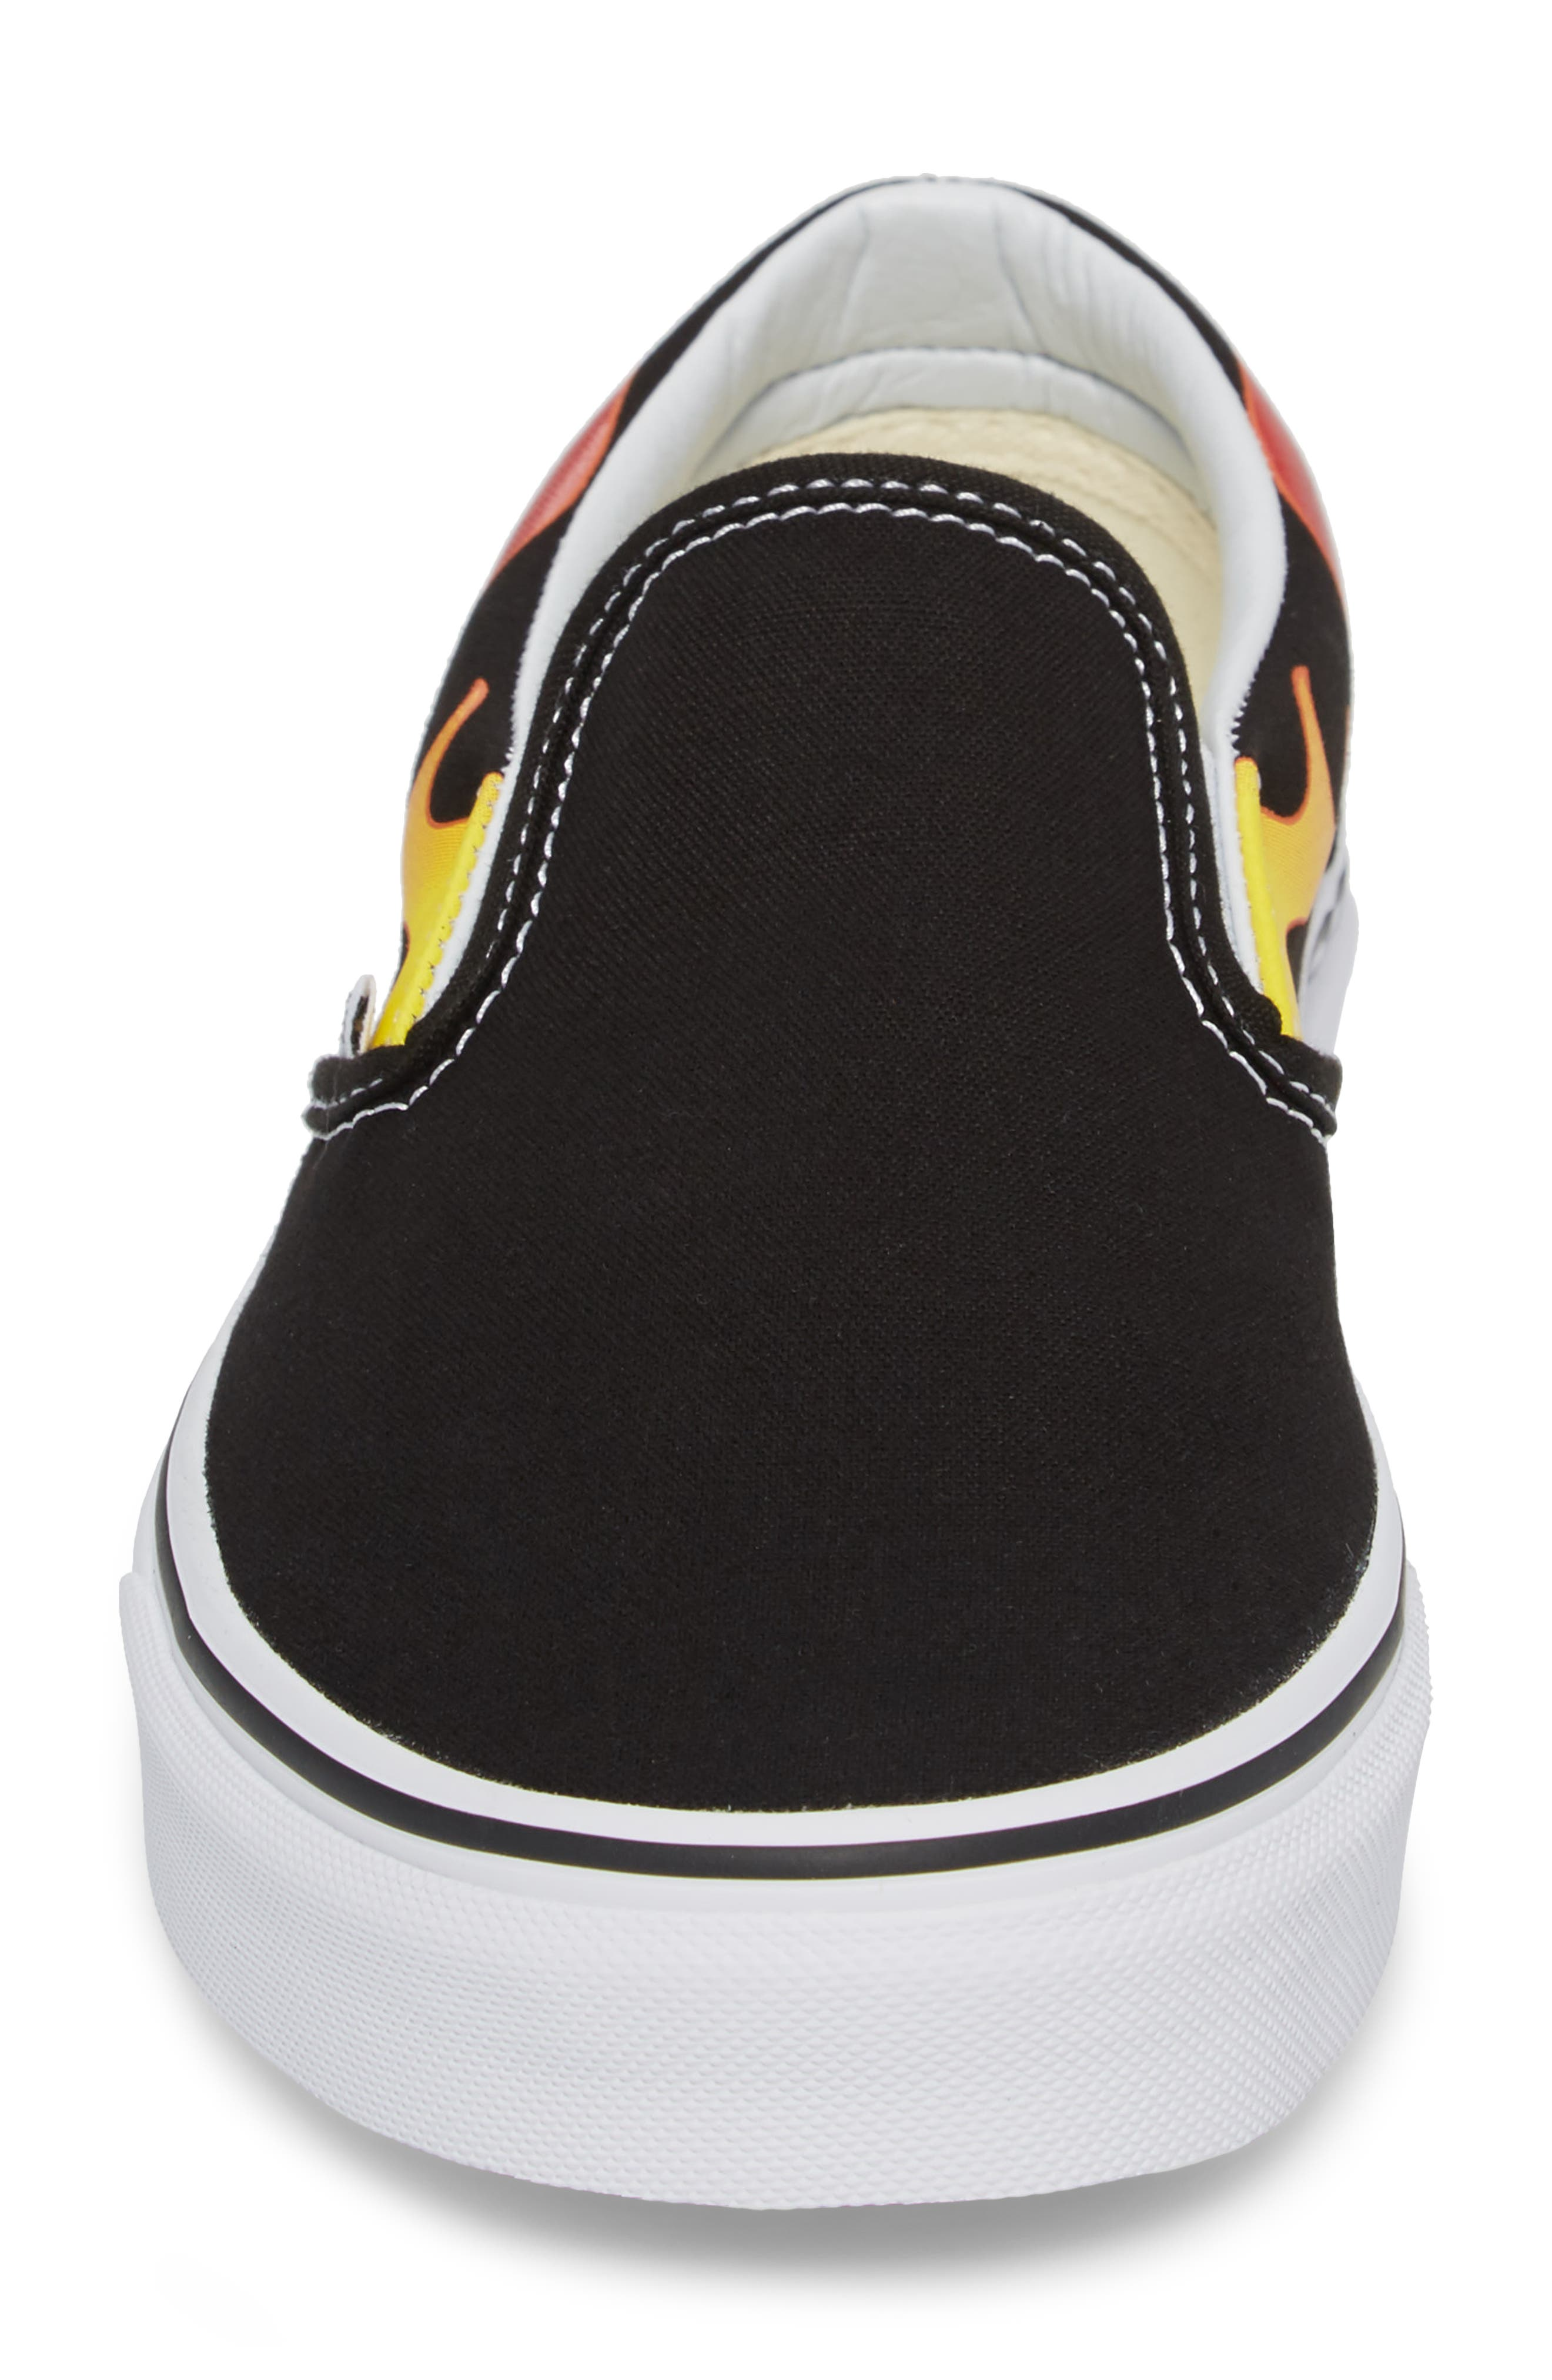 UA Classic Slip-On Sneaker,                             Alternate thumbnail 4, color,                             Black/ Black/ True White